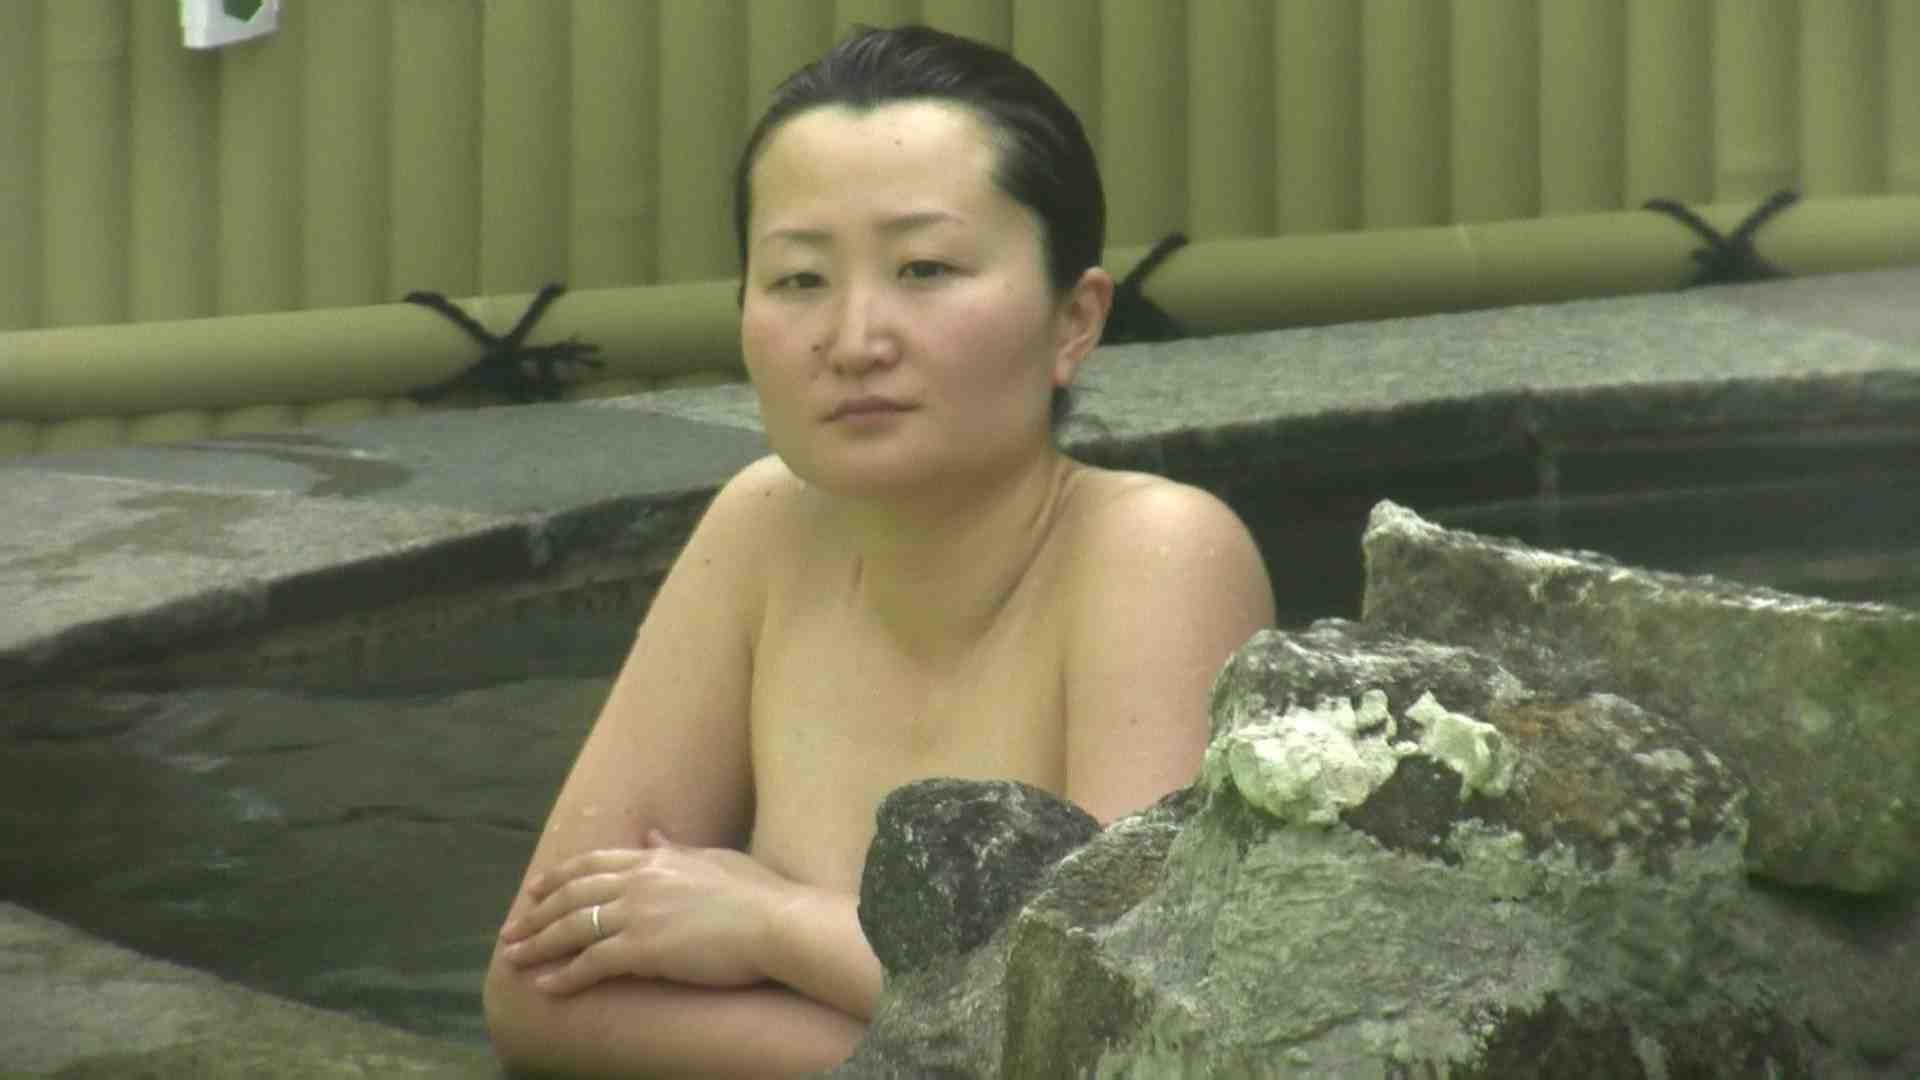 Aquaな露天風呂Vol.632 露天 戯れ無修正画像 70画像 41